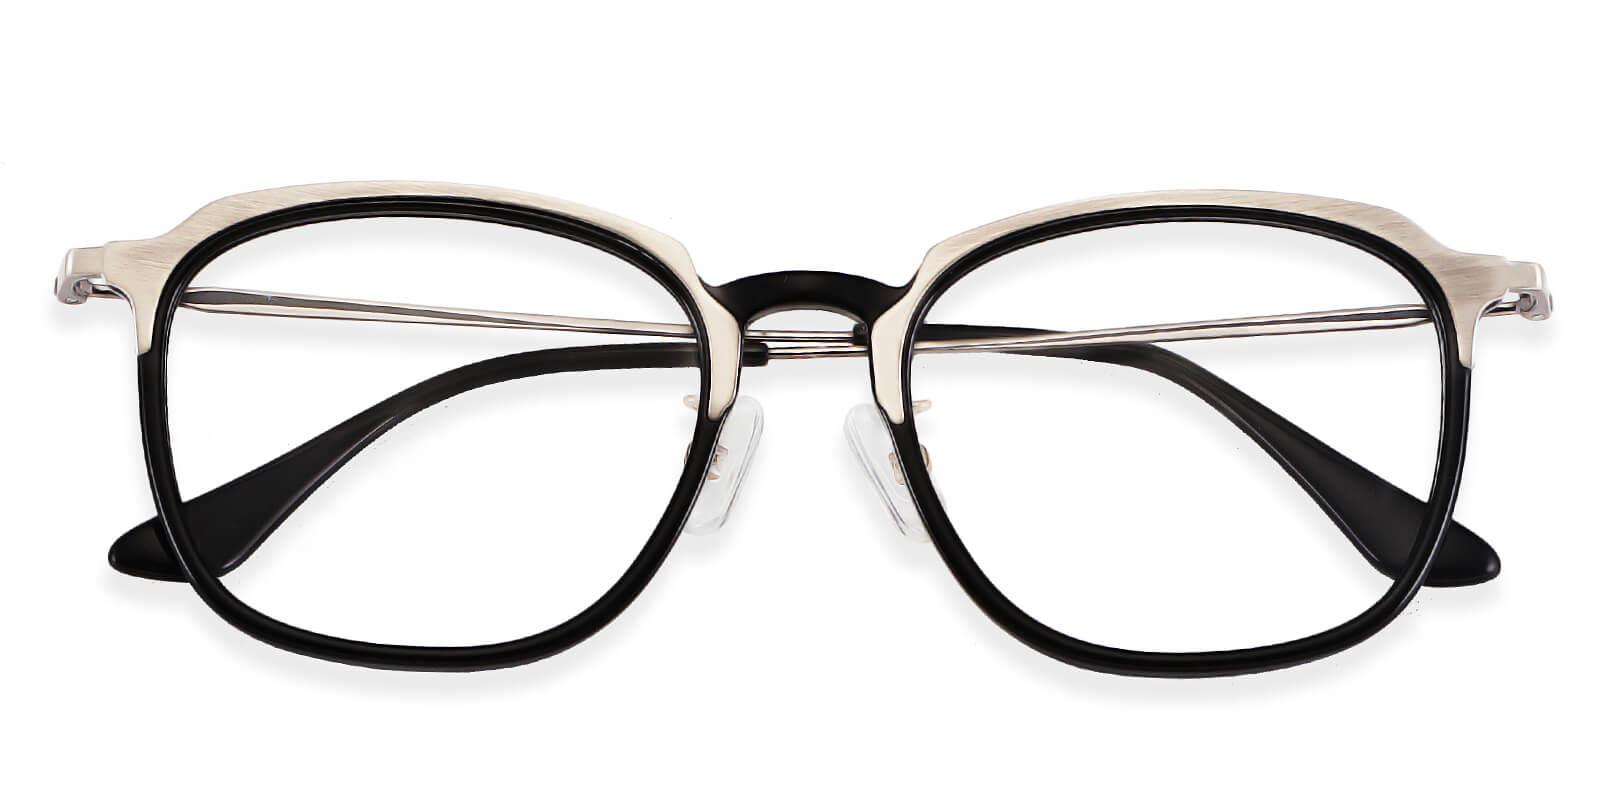 Aurora-Square acetate glasses : two tone layered glasses